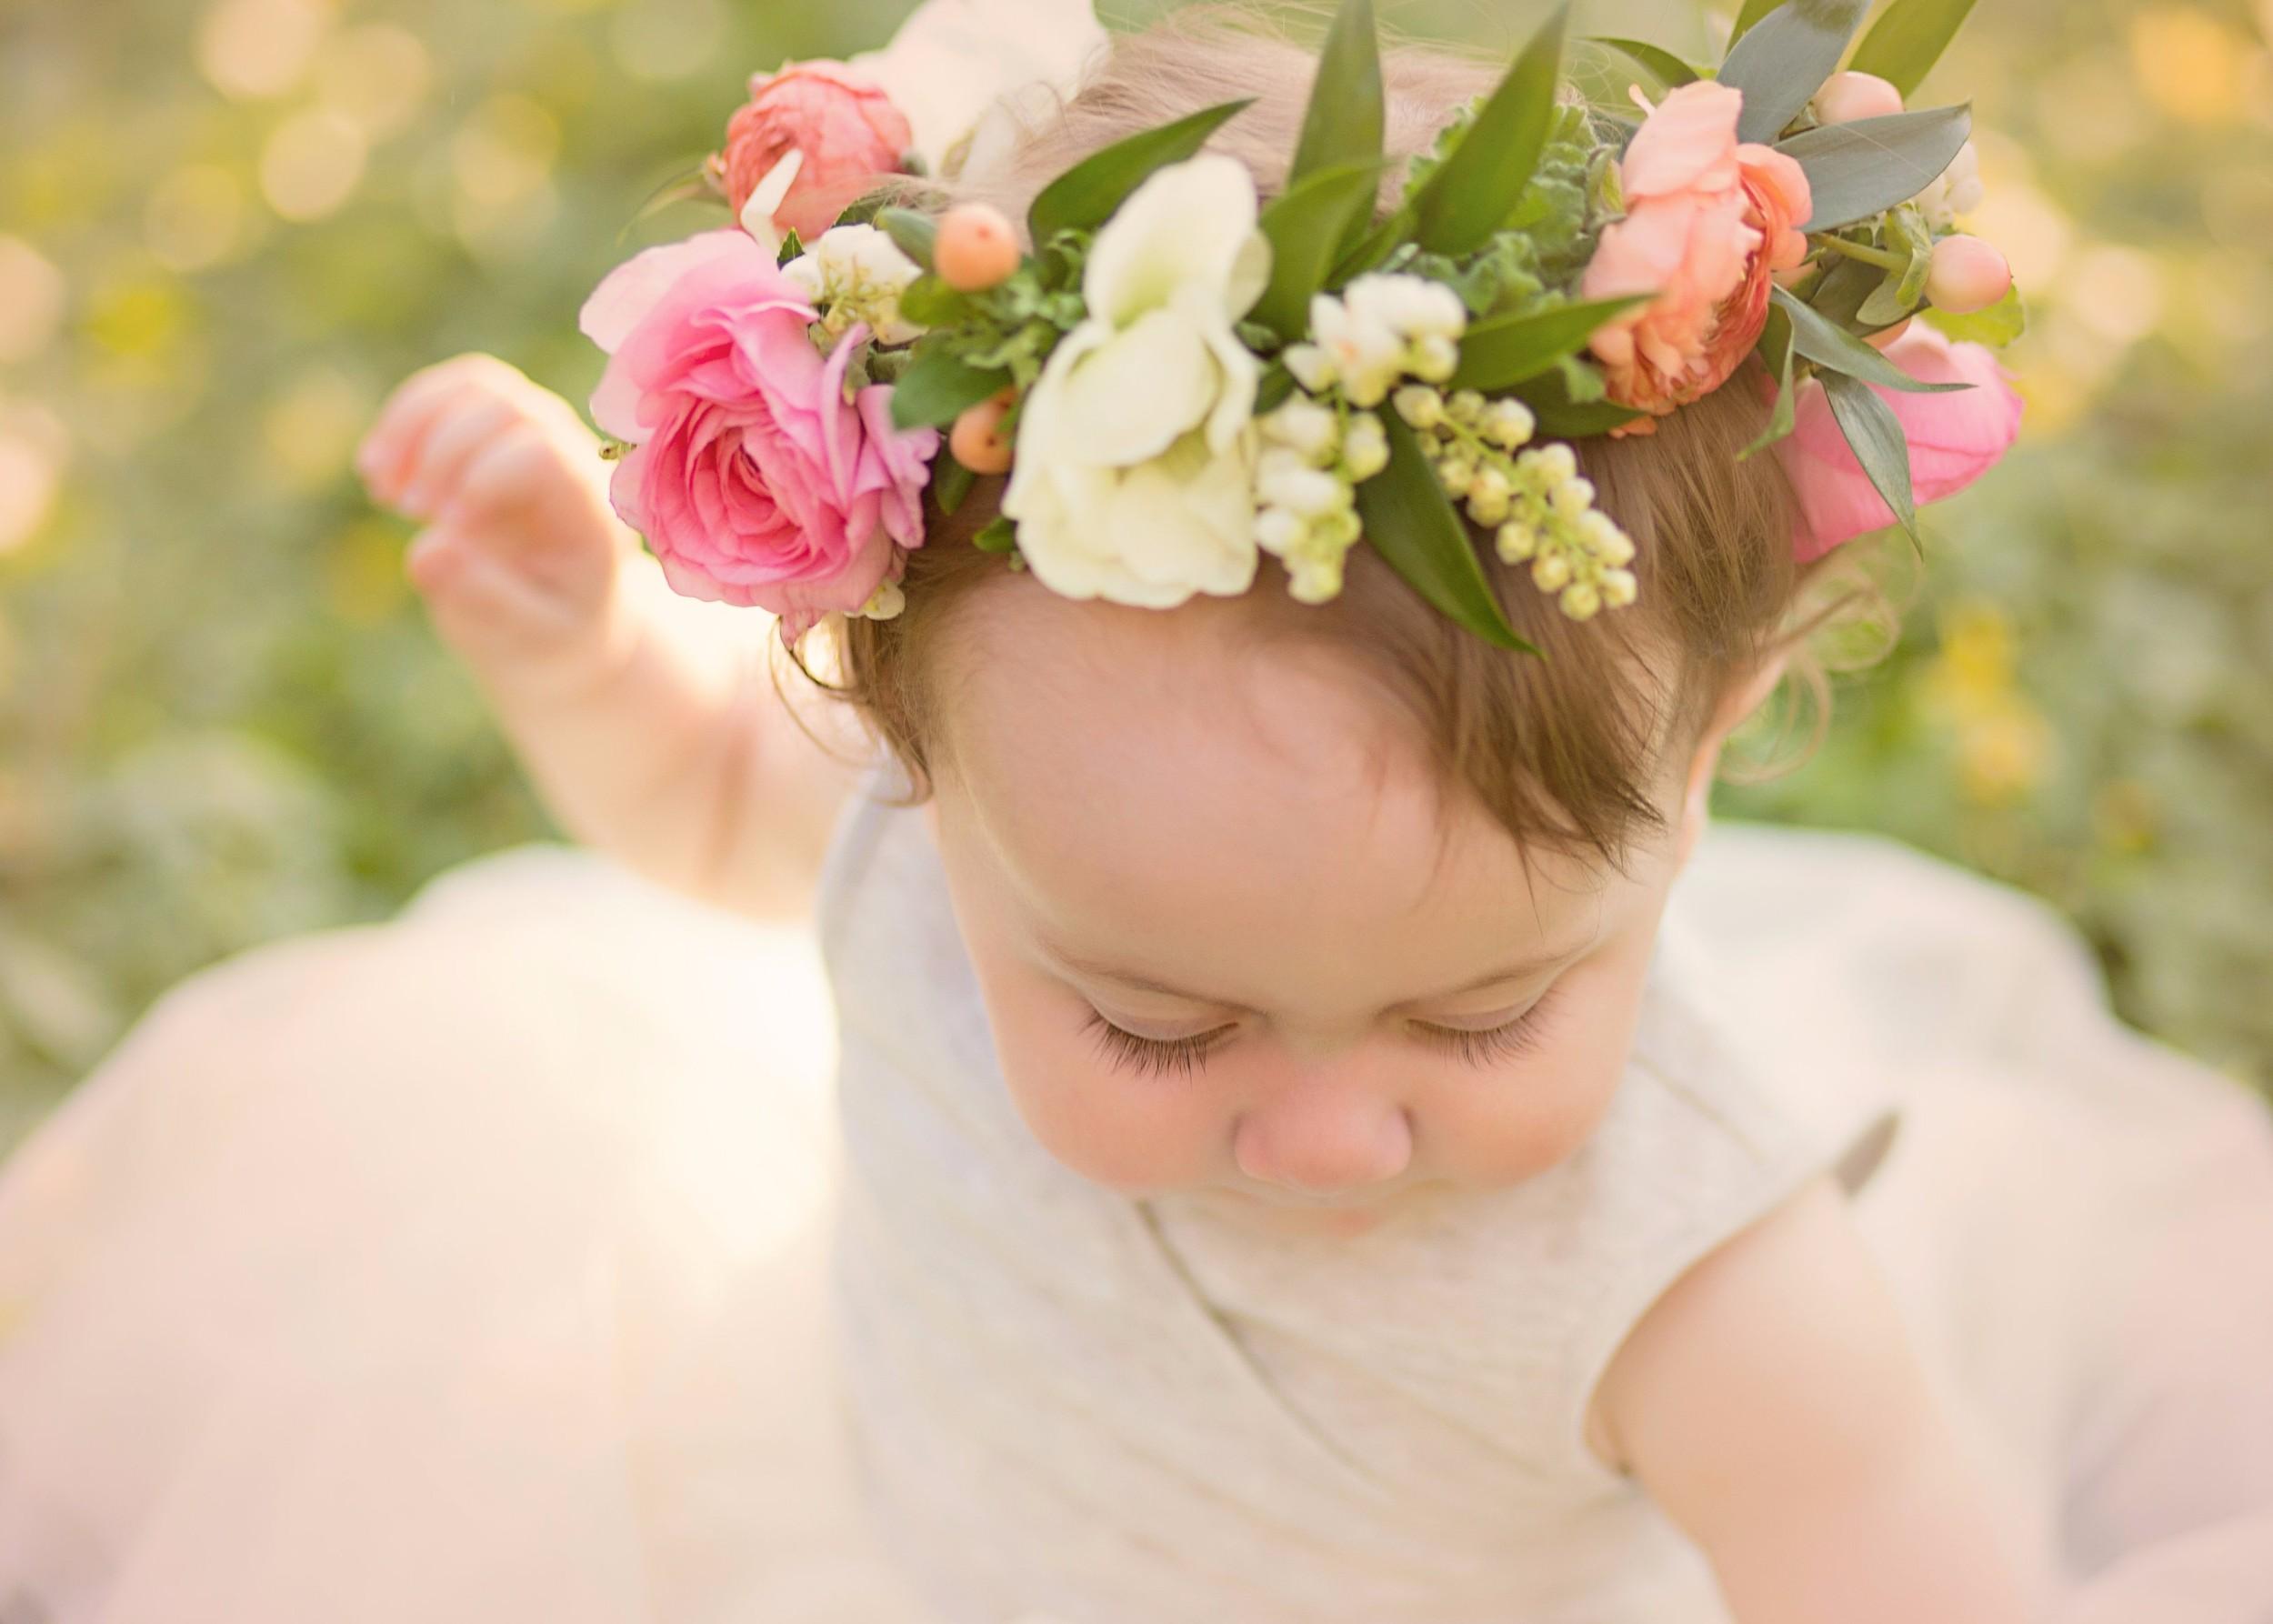 Dayton Ohio Baby Photographer Wegerzyn Gardens   Sweet Bloom Photography   www.sweetbloomphotography.com